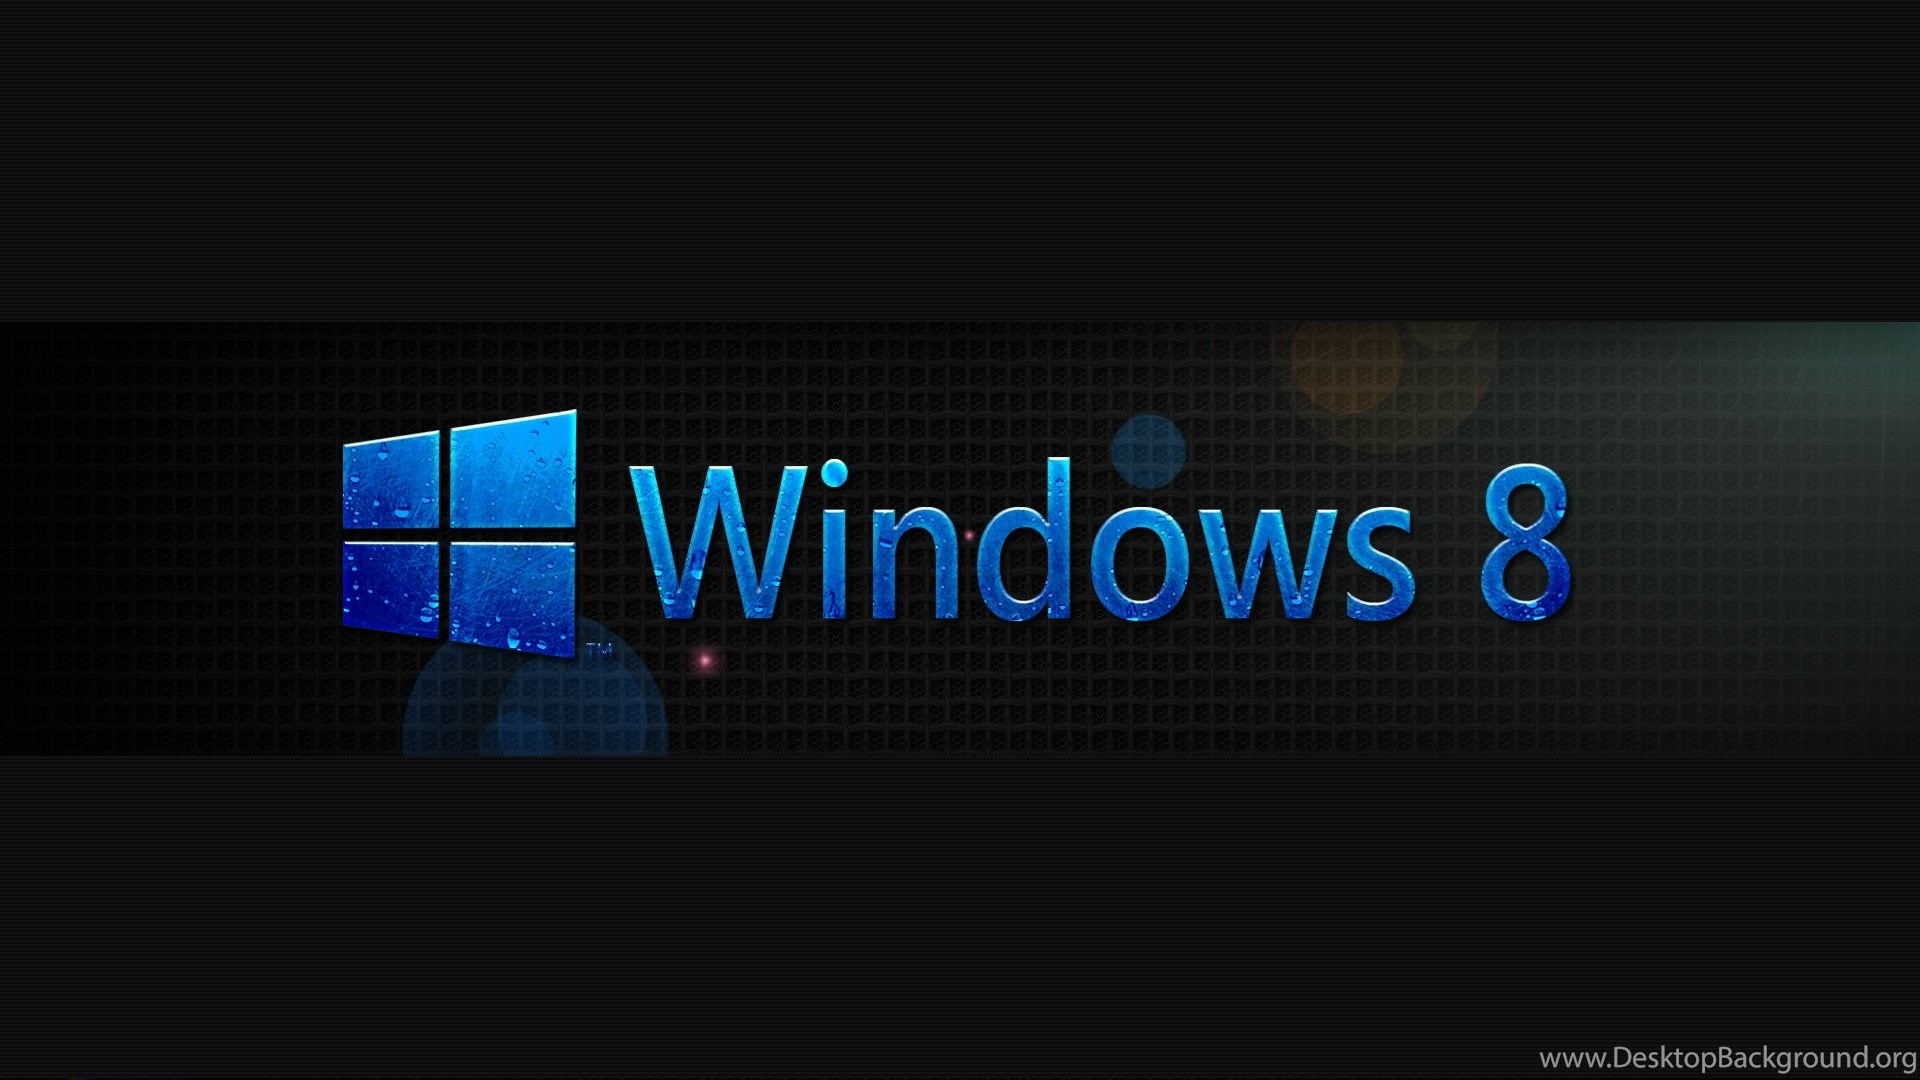 Lenovo Windows 8 Wallpapers Desktop Background